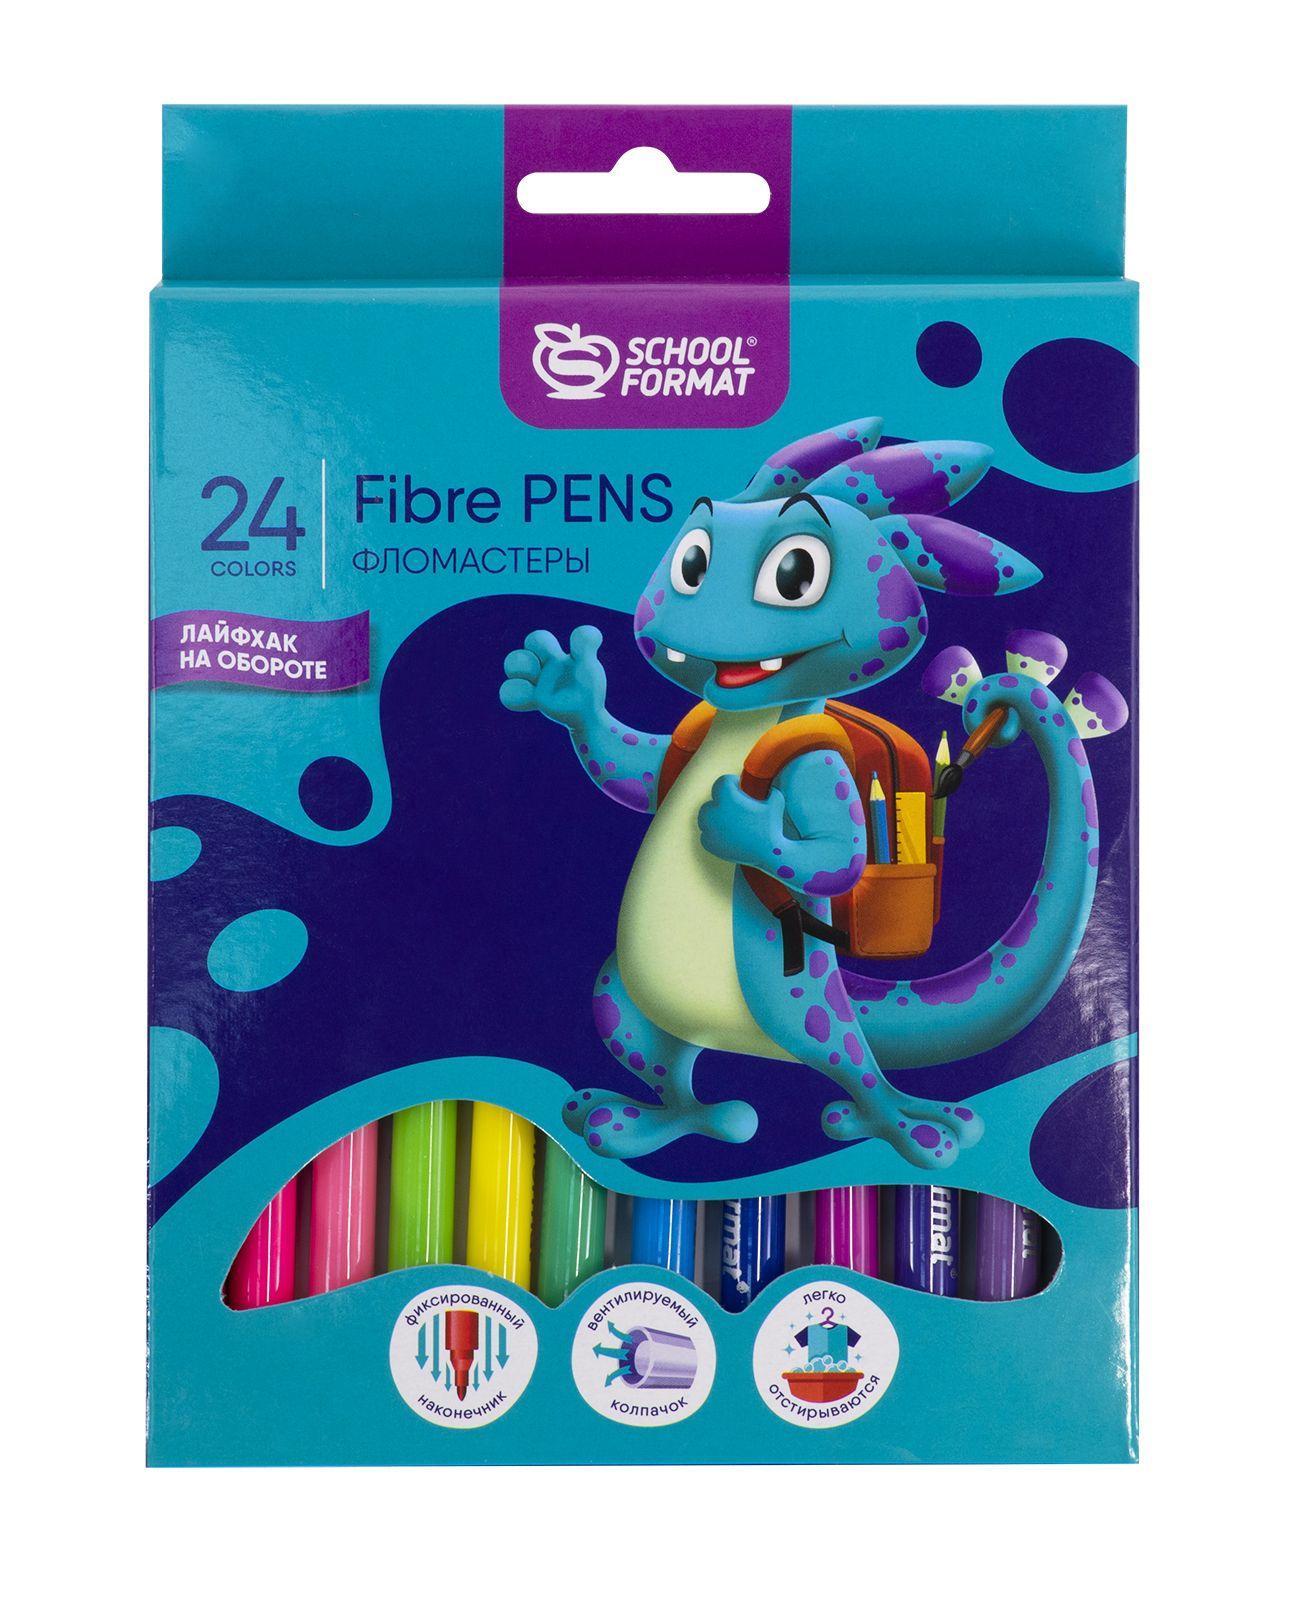 Фломастеры schoolФОРМАТ SMART DINO 24 цвета, картонная упаковка, круглый корпус, стандартные